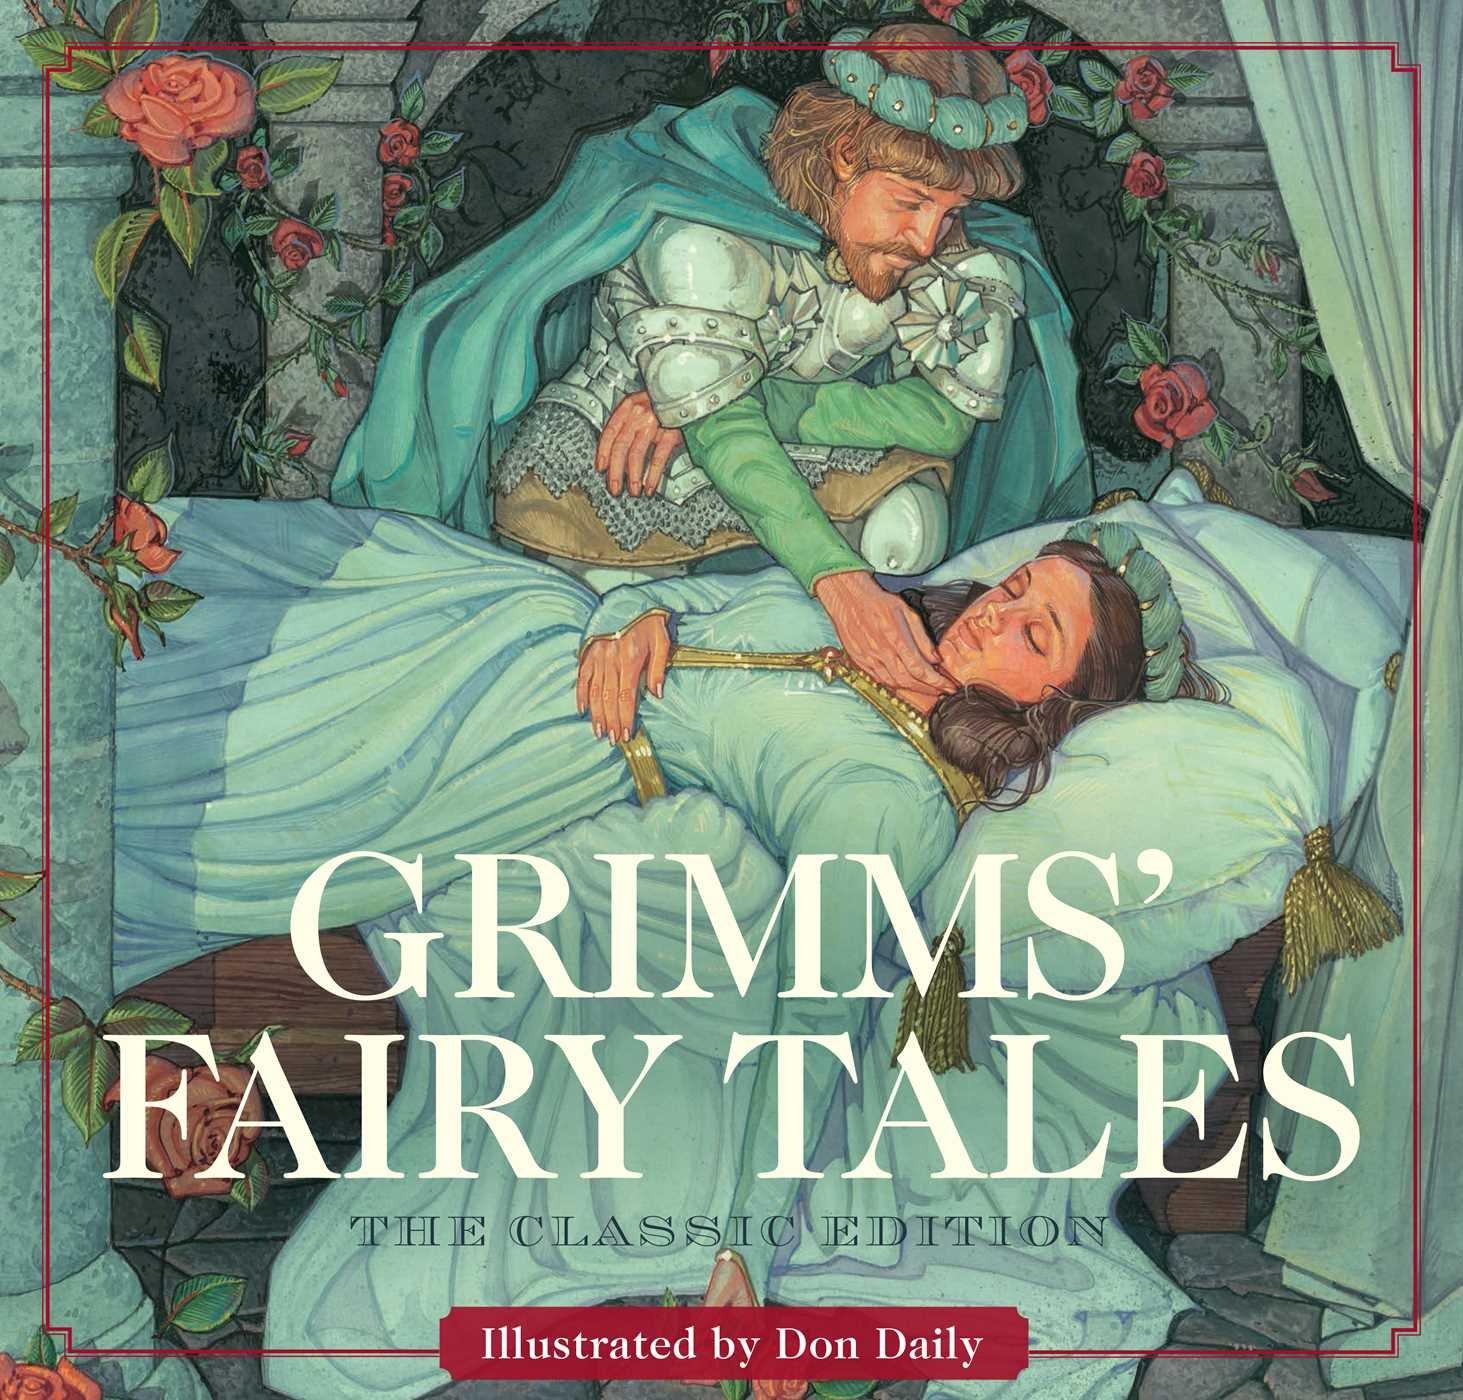 Grimms' Fairy Tales ebook